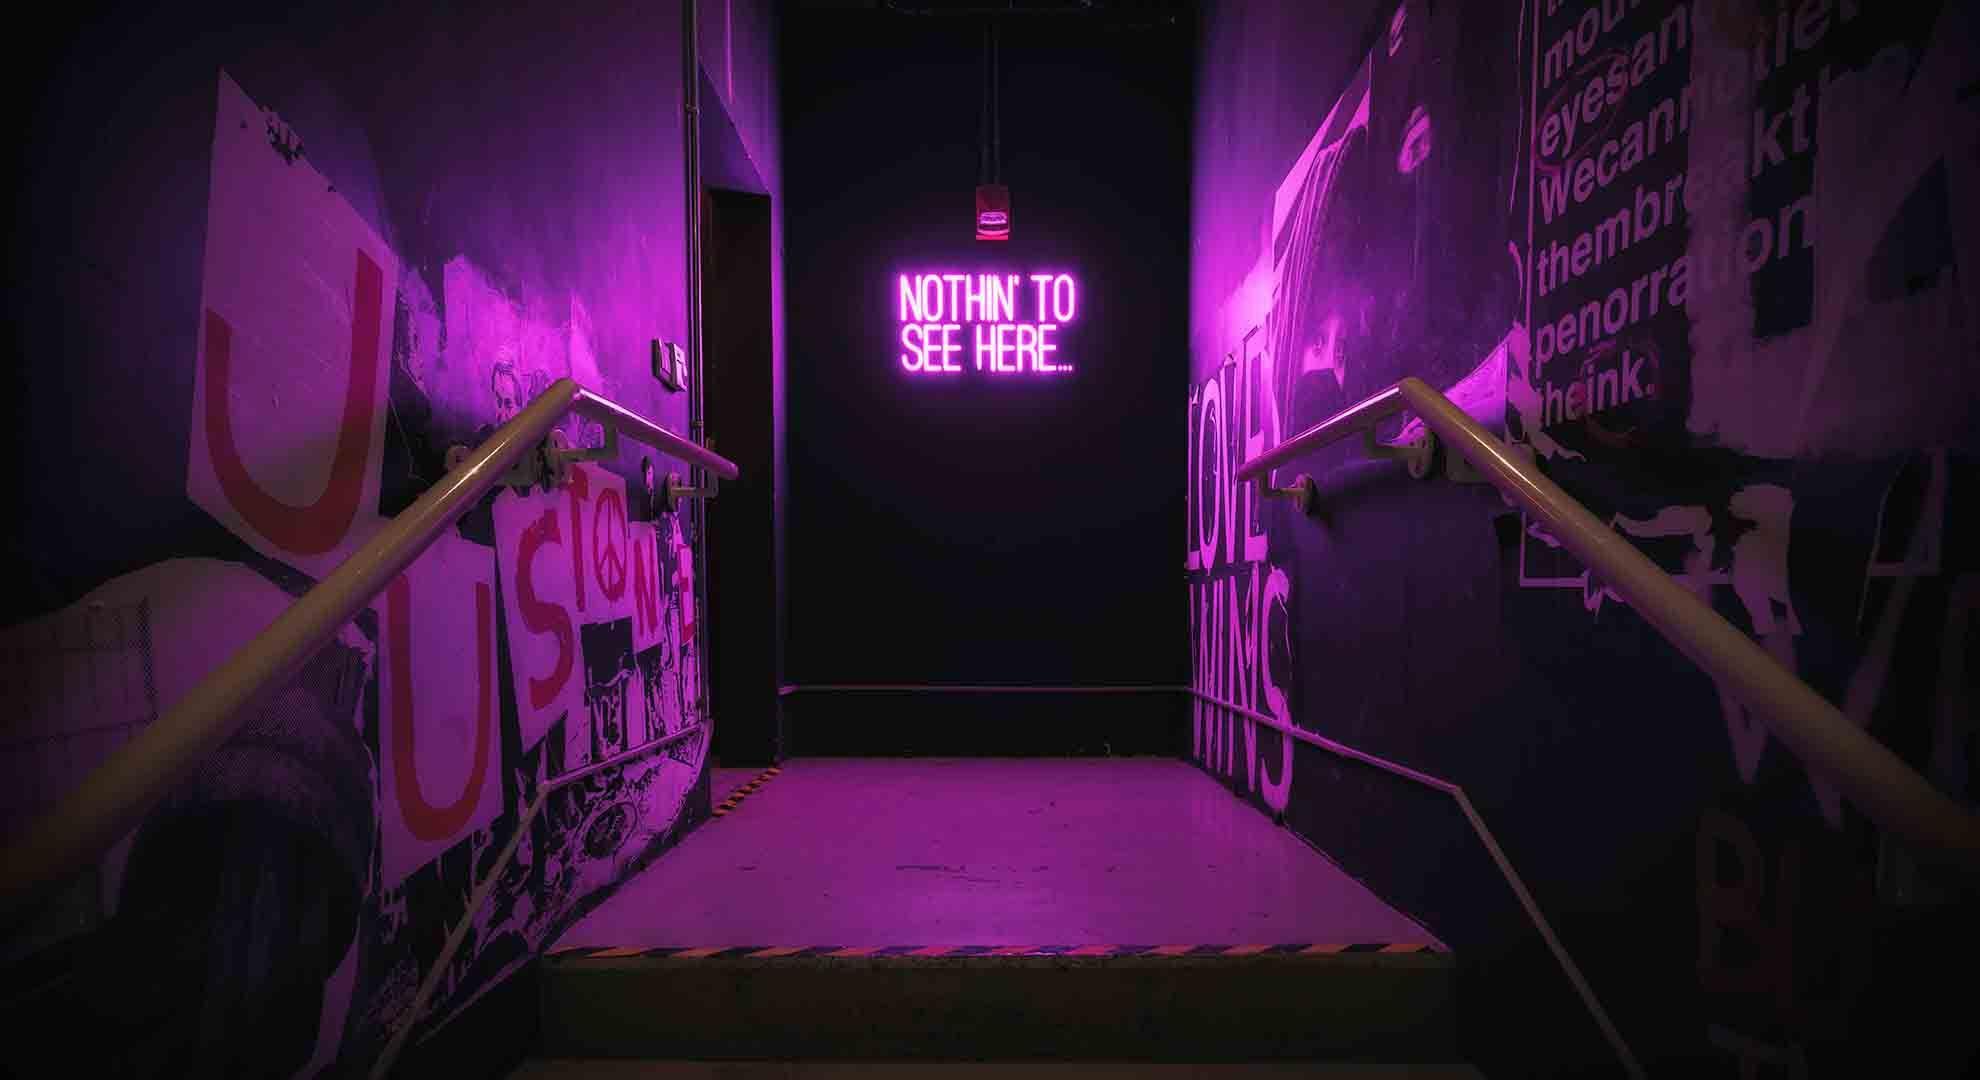 Purple Neon Aesthetic HD Desktop Wallpapers - Wallpaper Cave